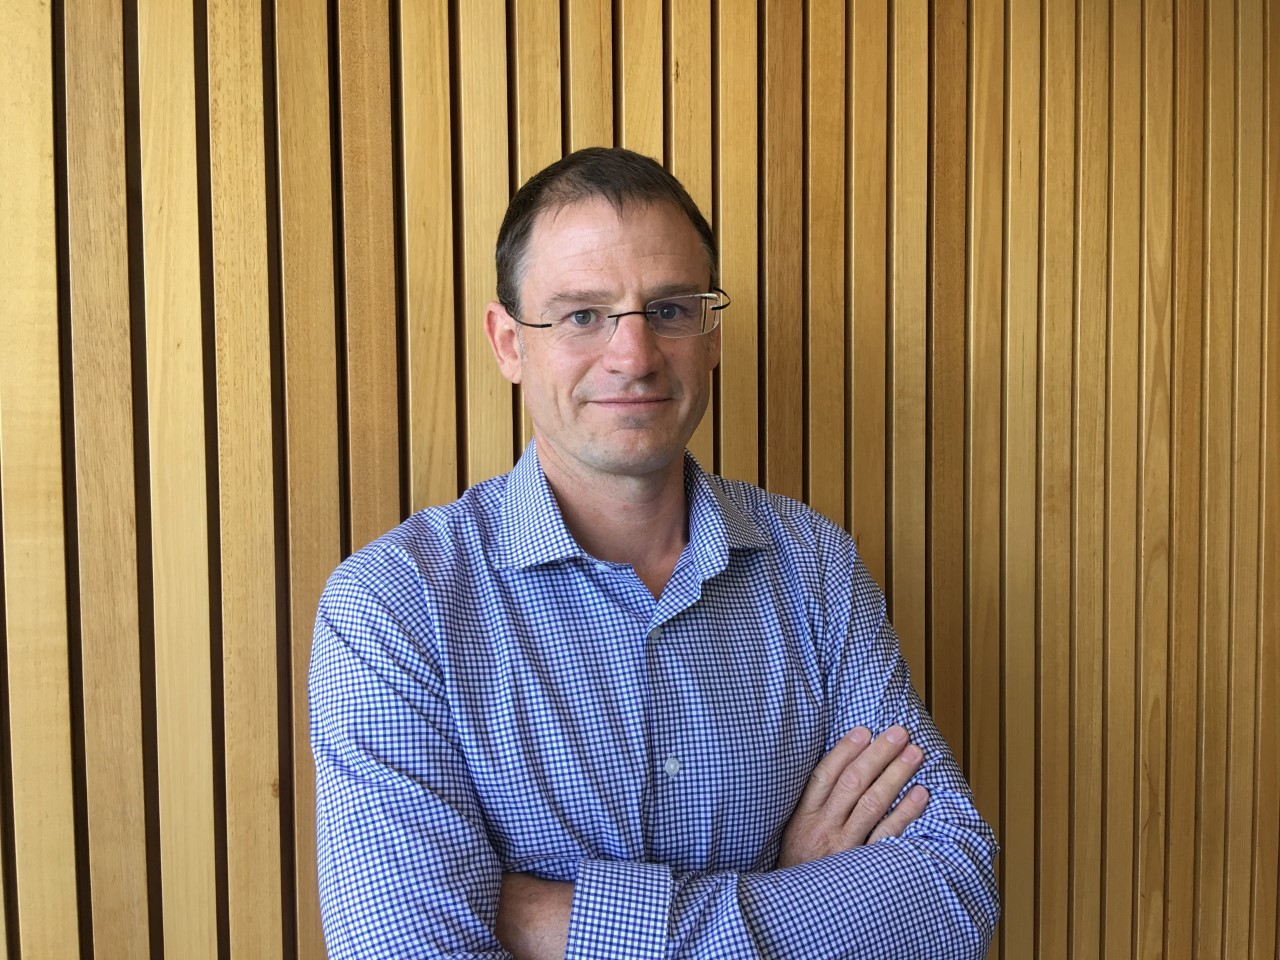 Alastair Macdiarmid